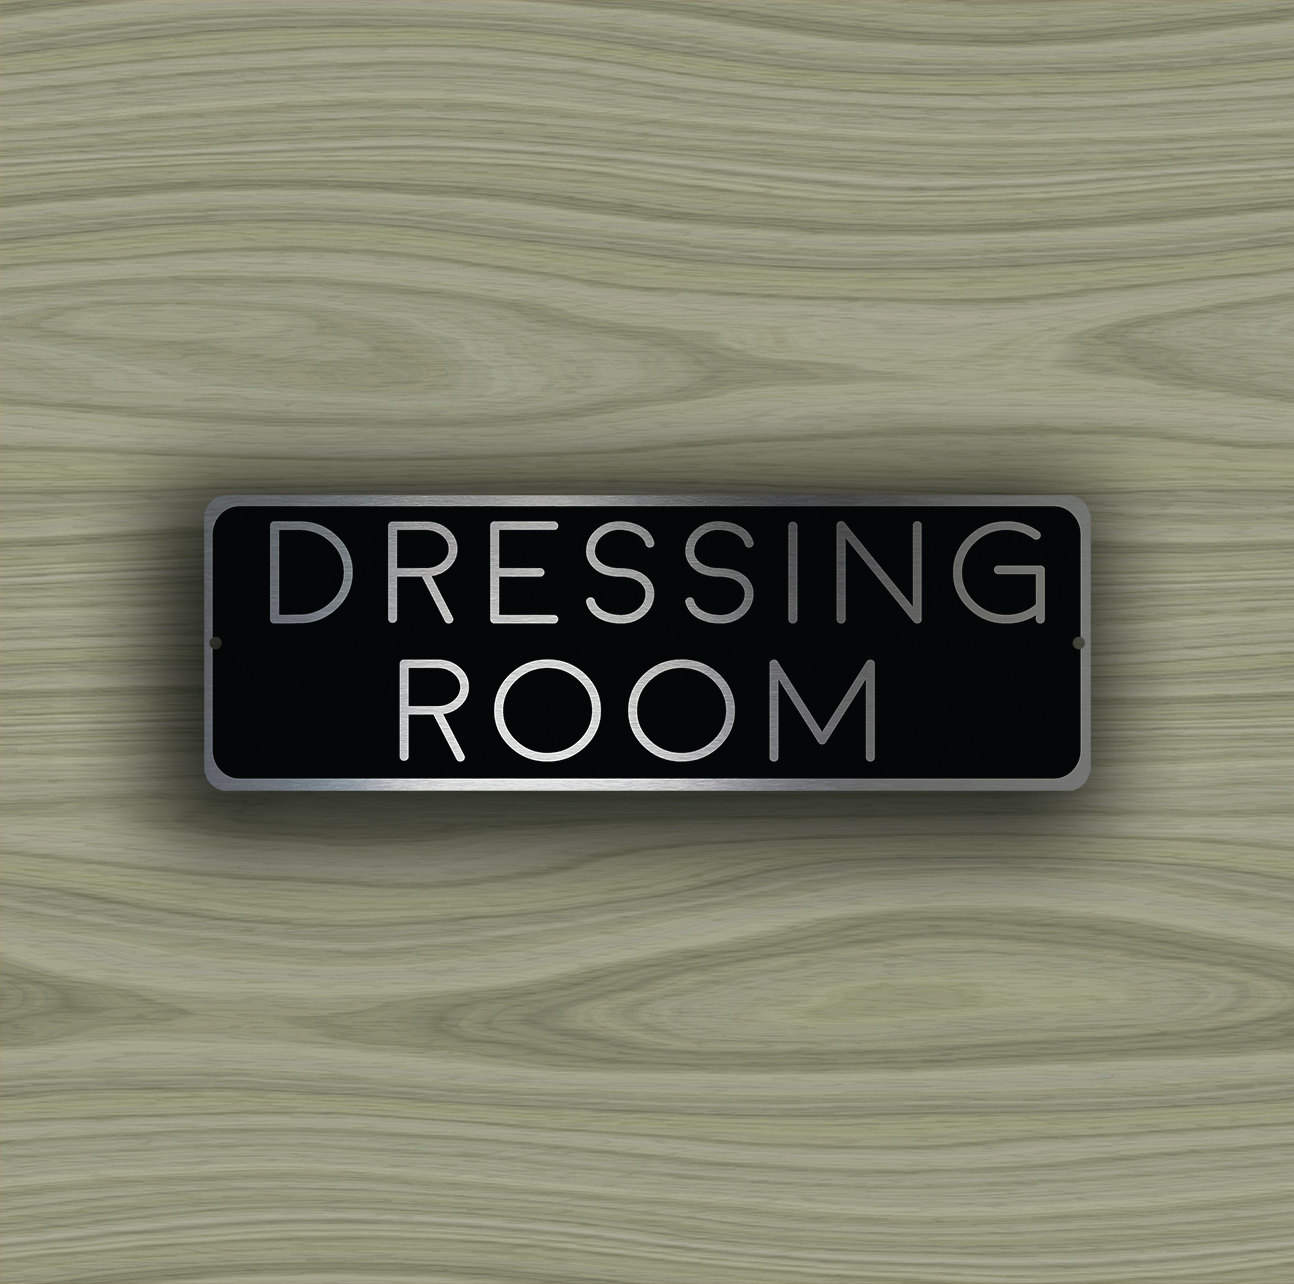 Dressing Room Signs Site Pinterest Com